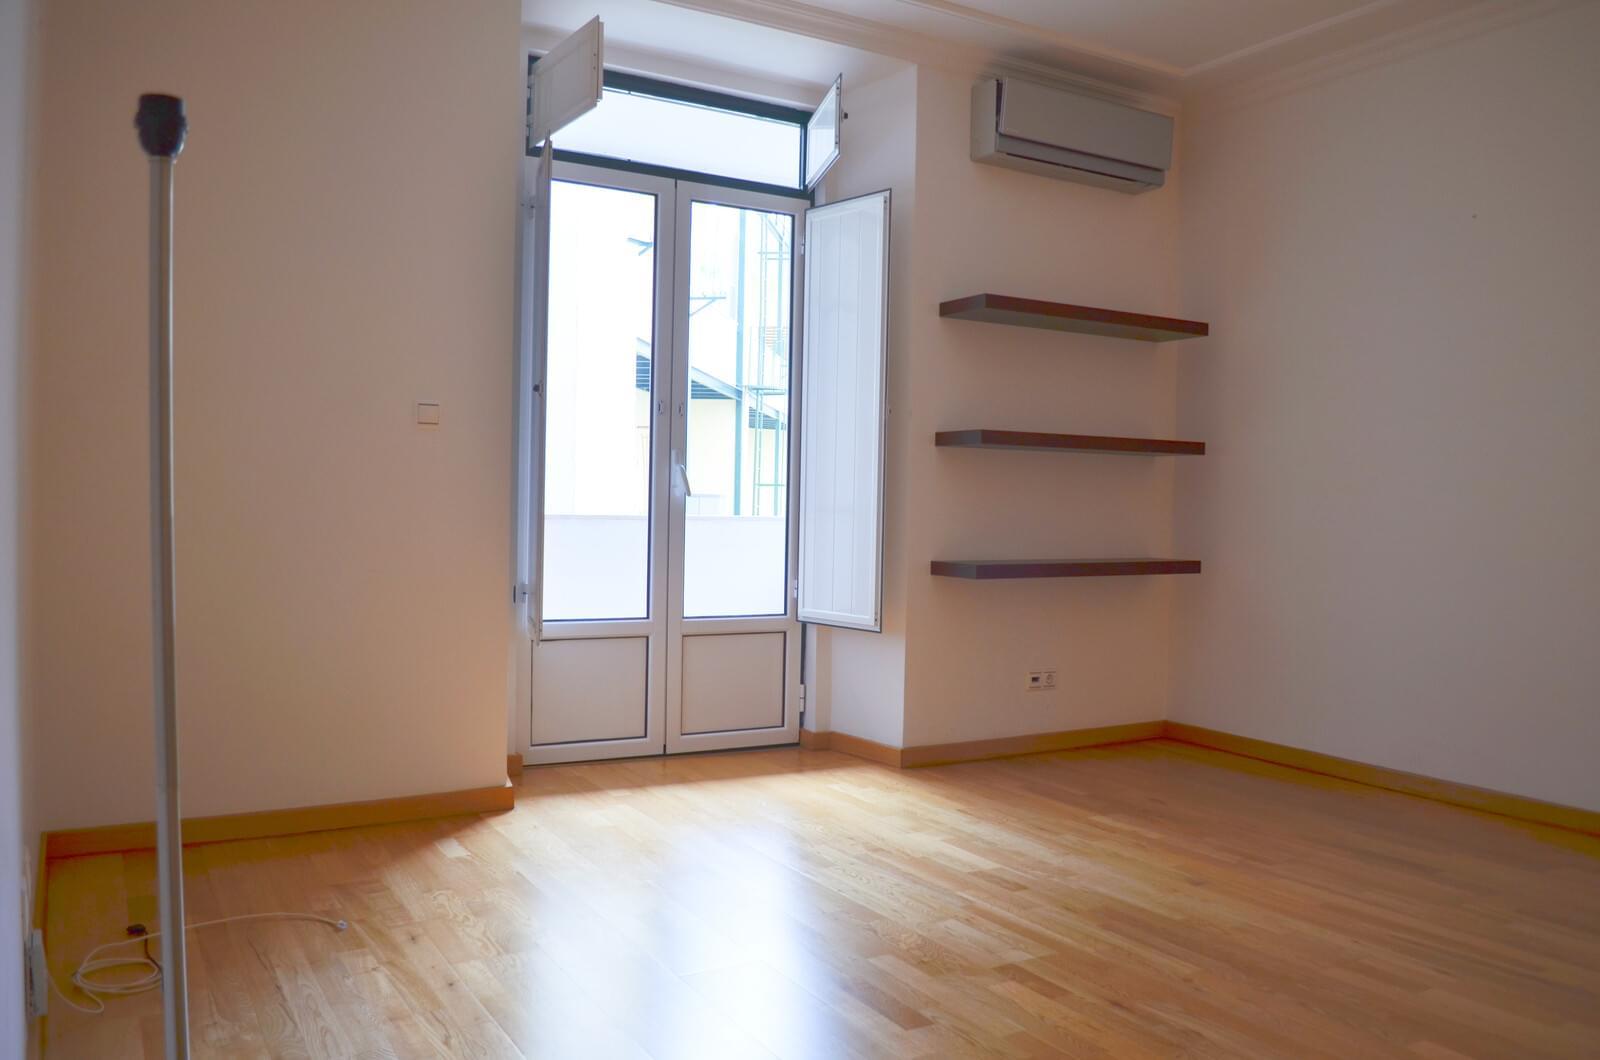 pf18839-apartamento-t2-lisboa-9886dd6b-372a-49a7-a0c1-3f922e3e8207